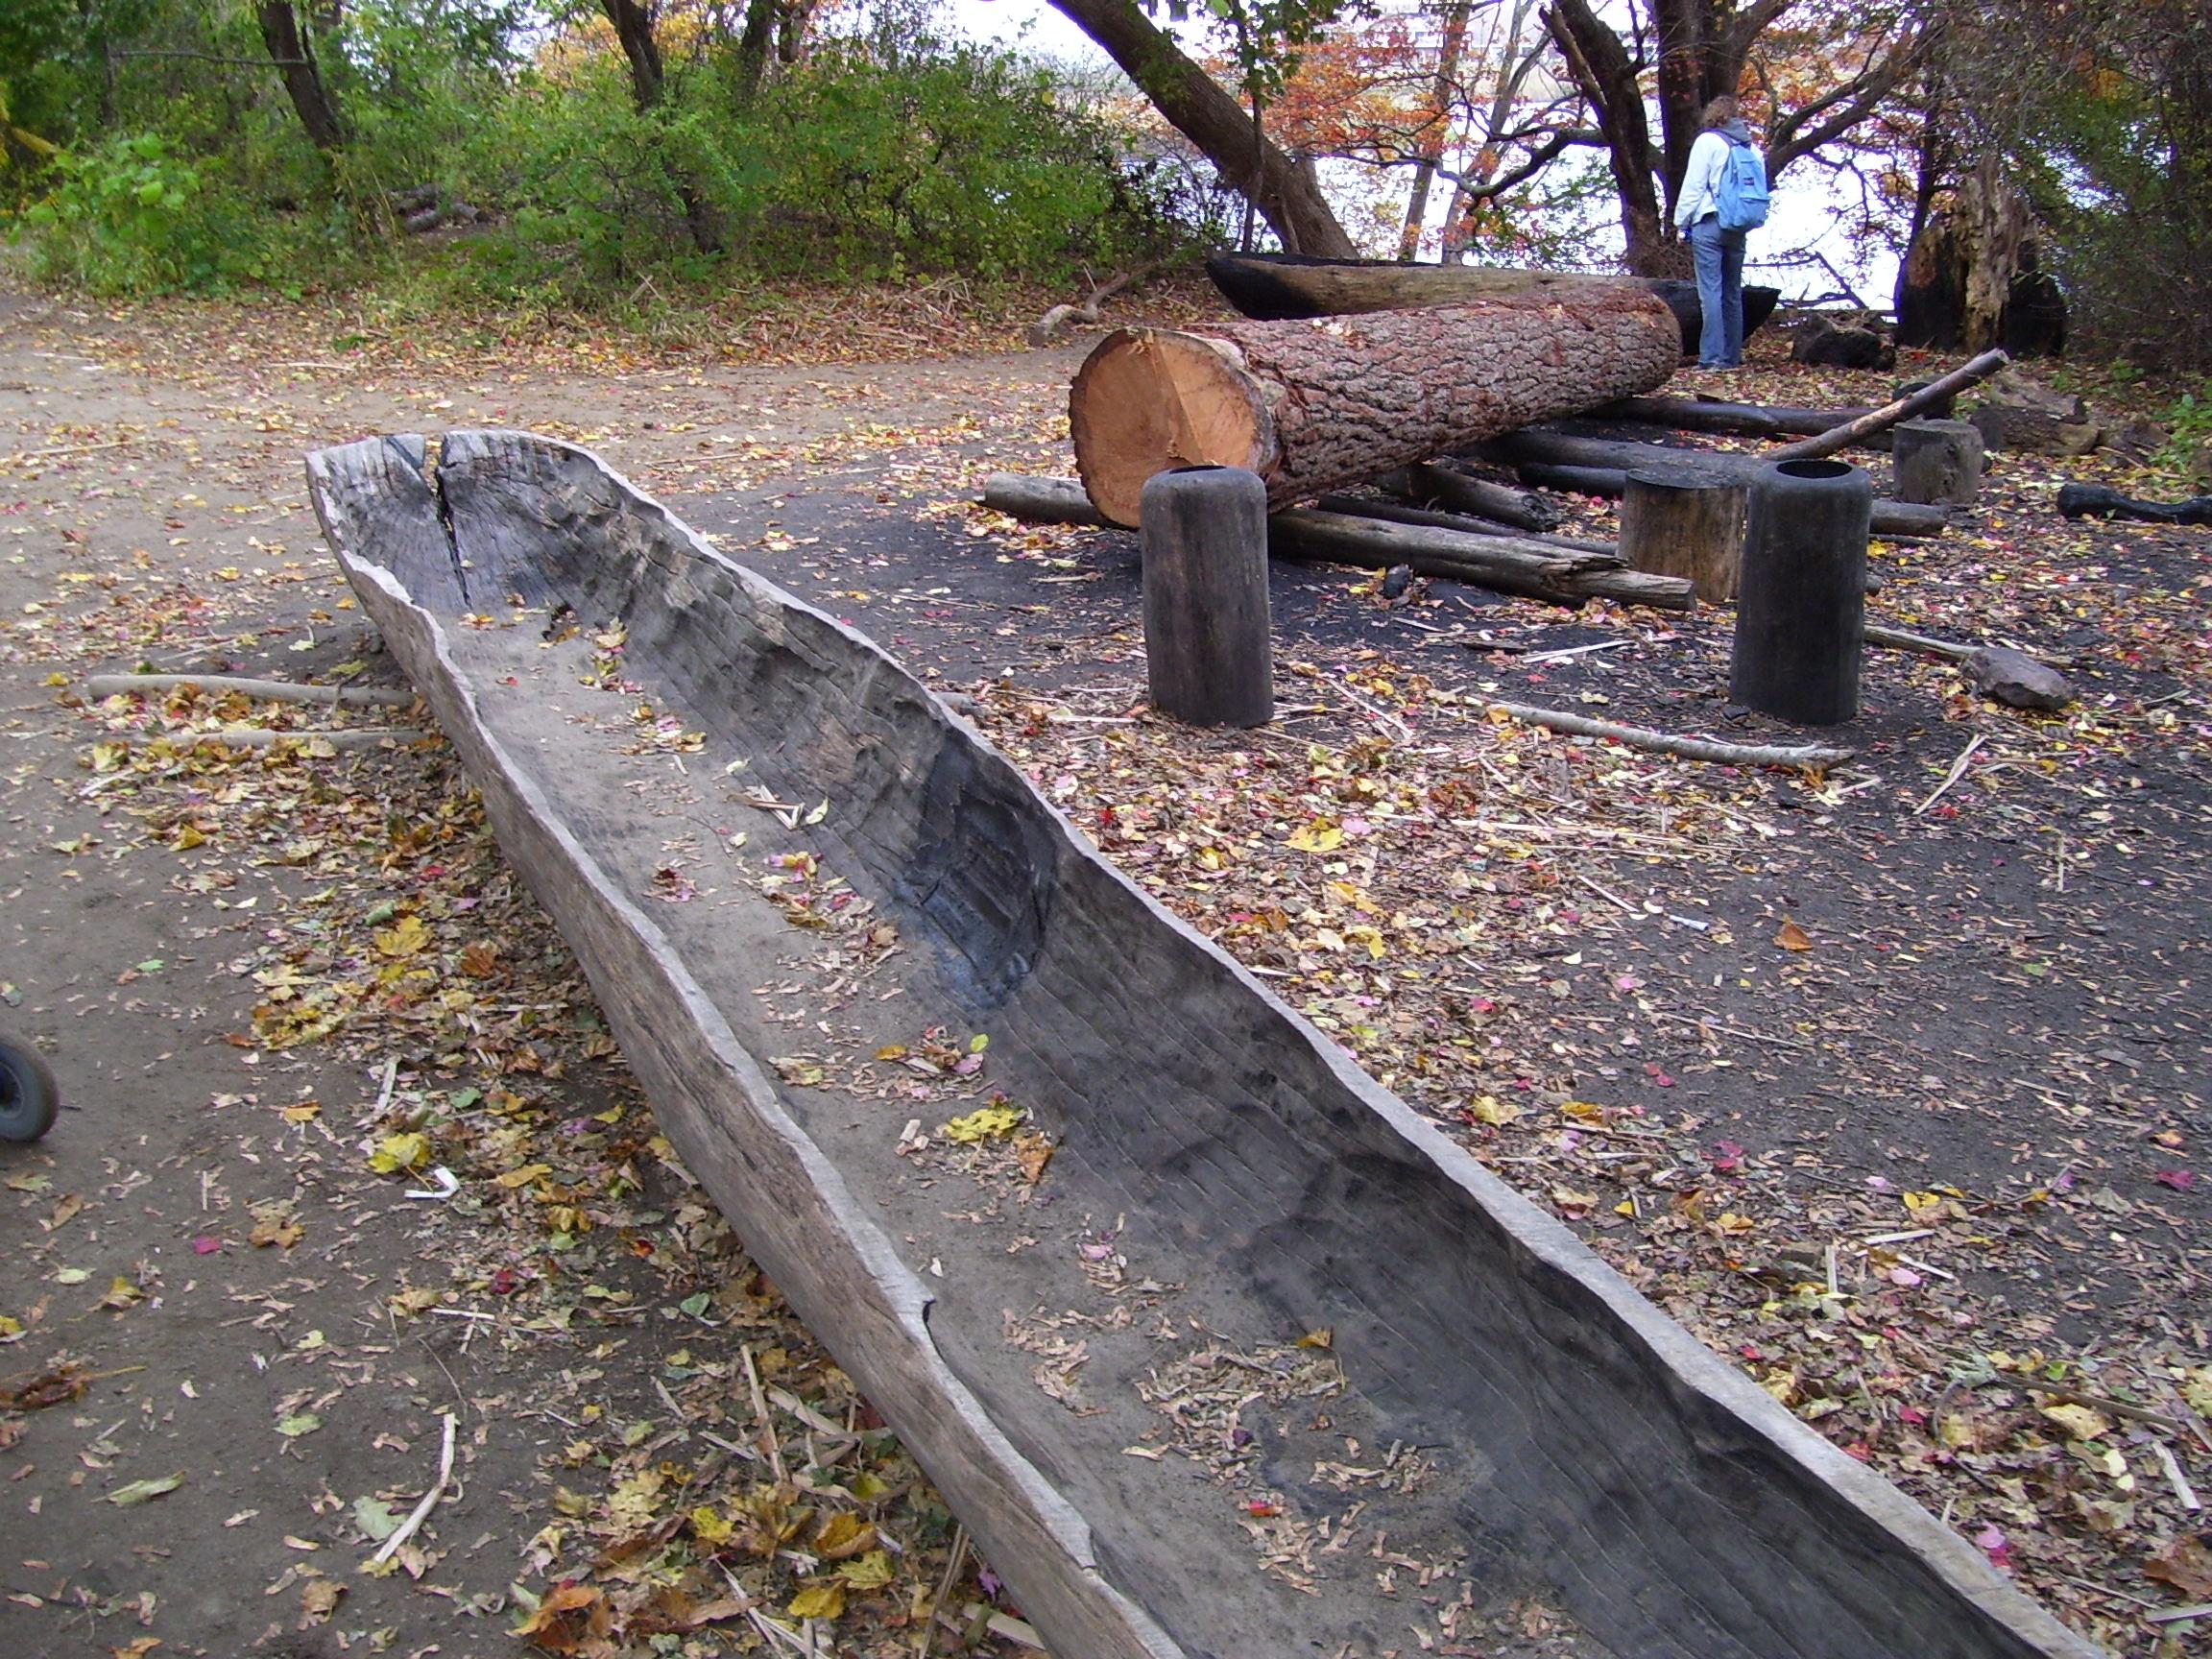 File Plimoth Plantation Canoe Jpg Wikimedia Commons